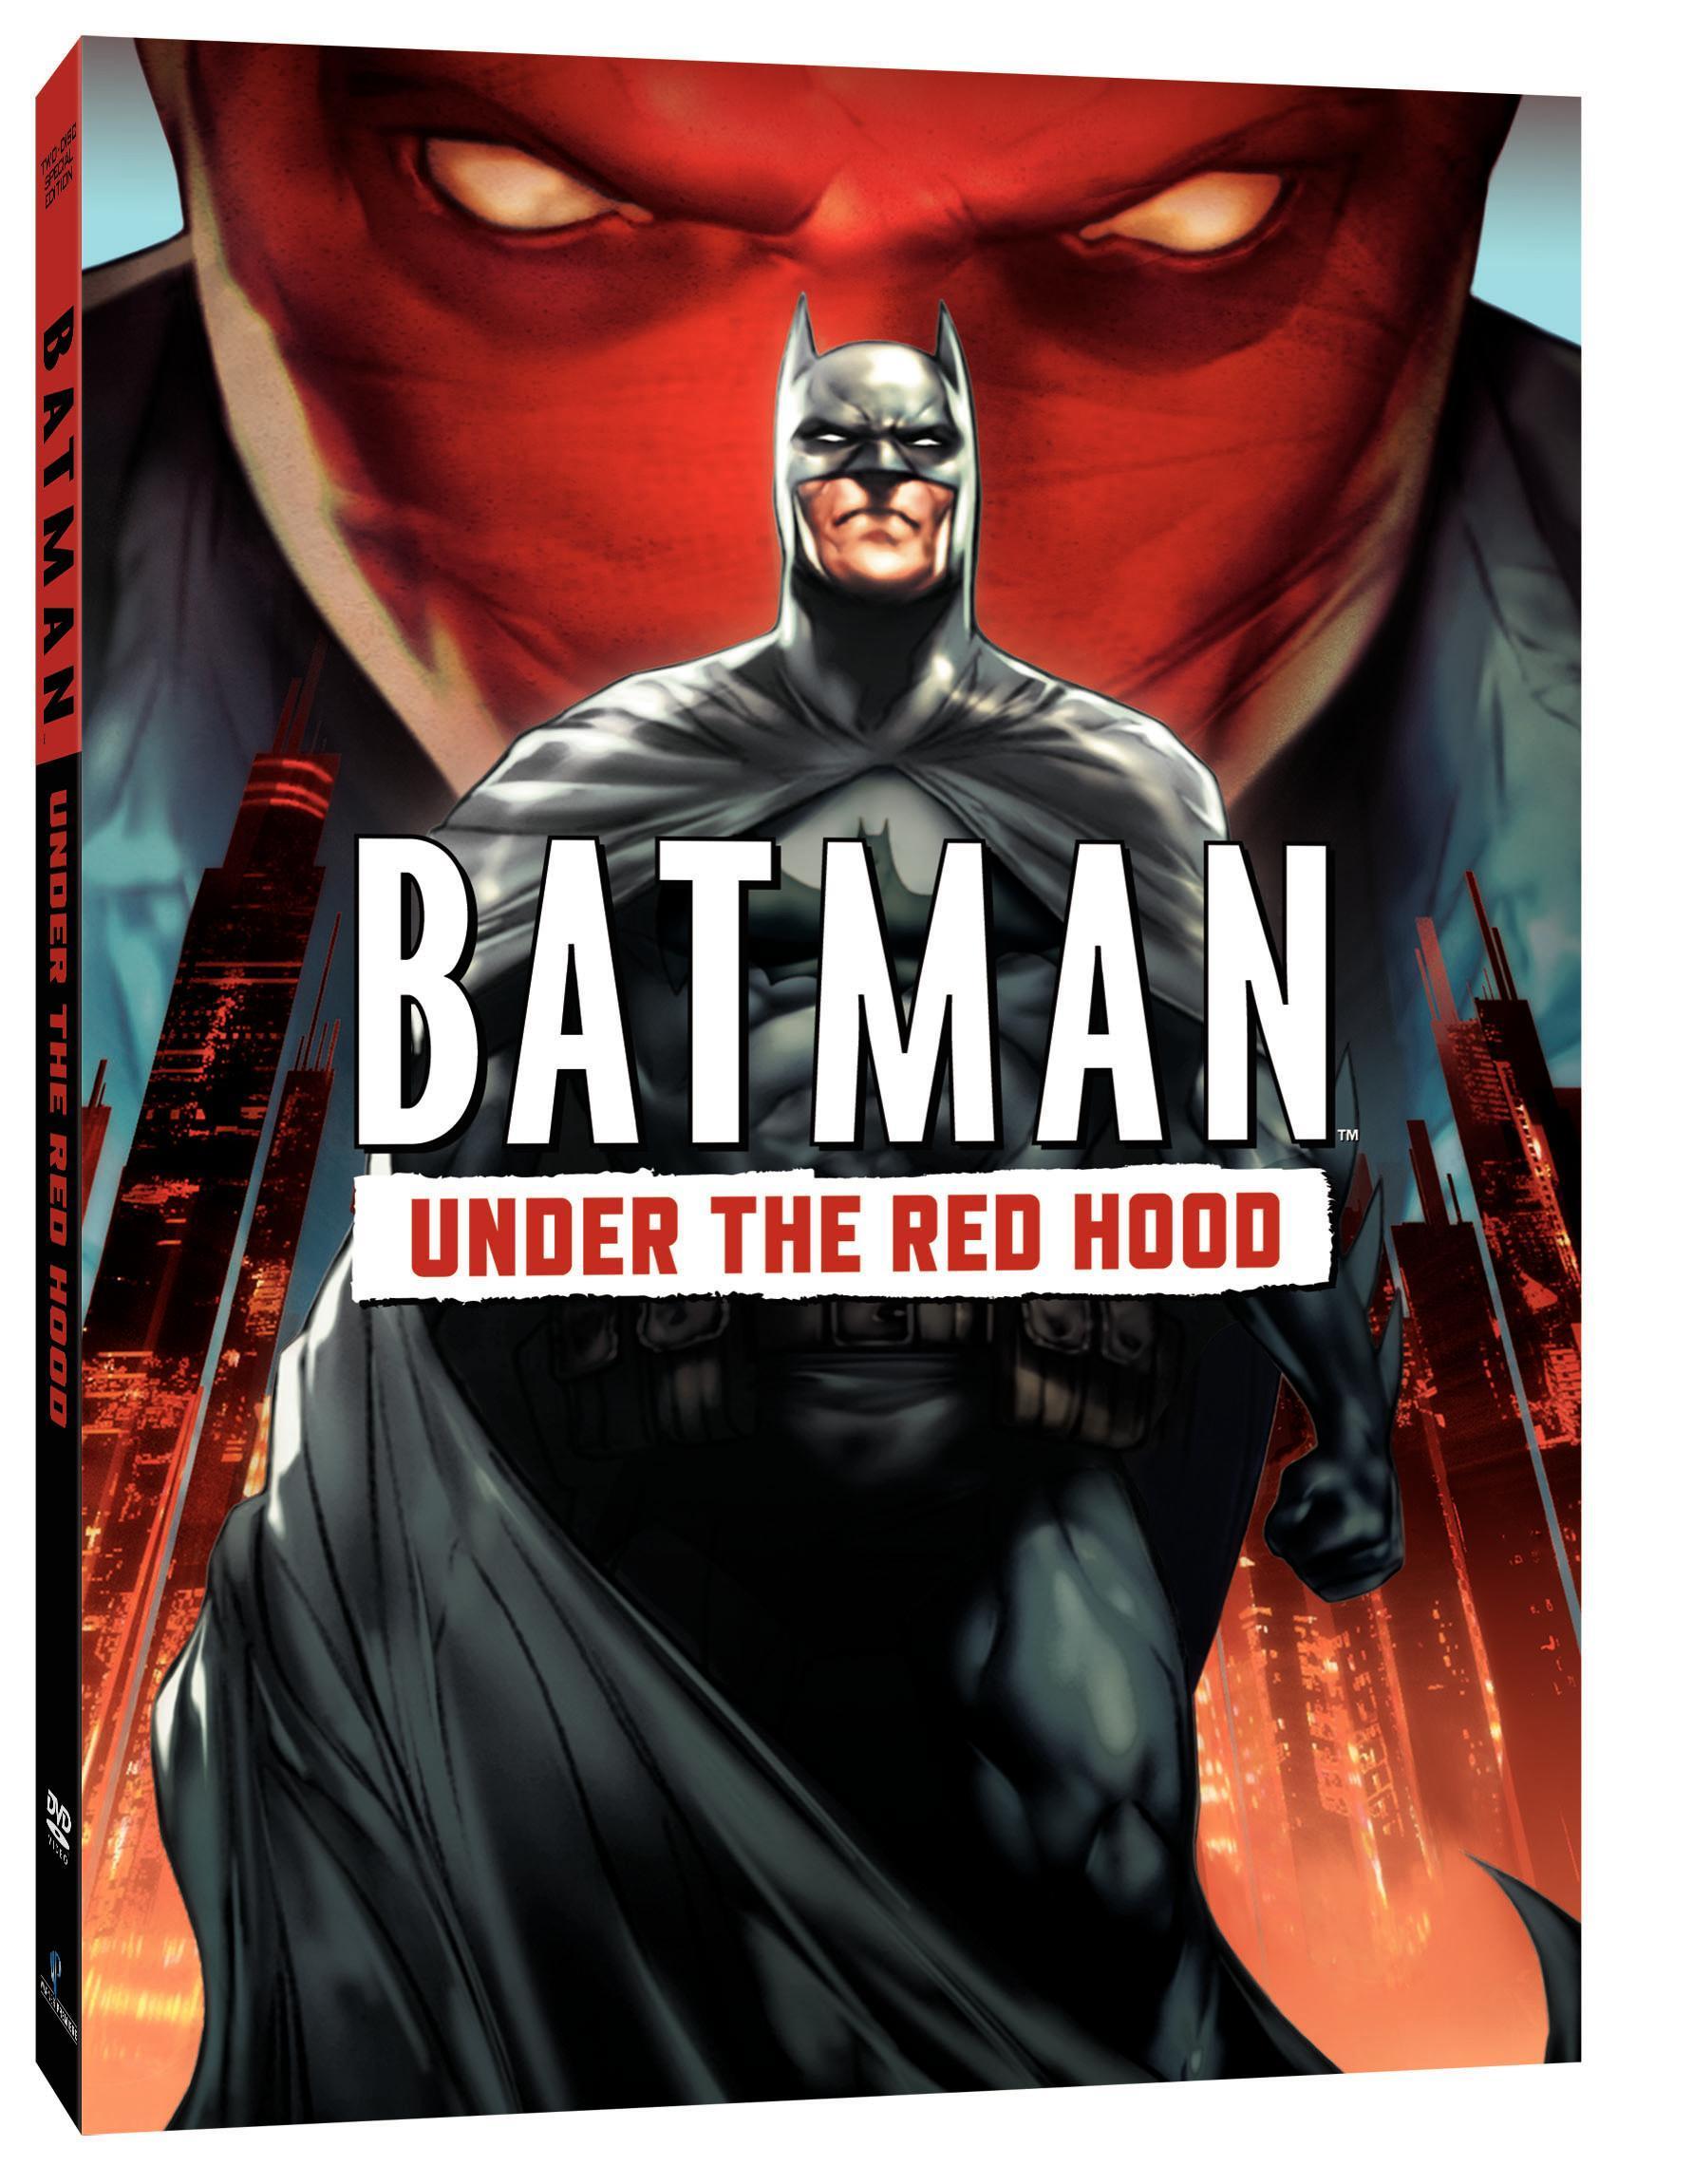 Batman Under The Red Hood Home Video